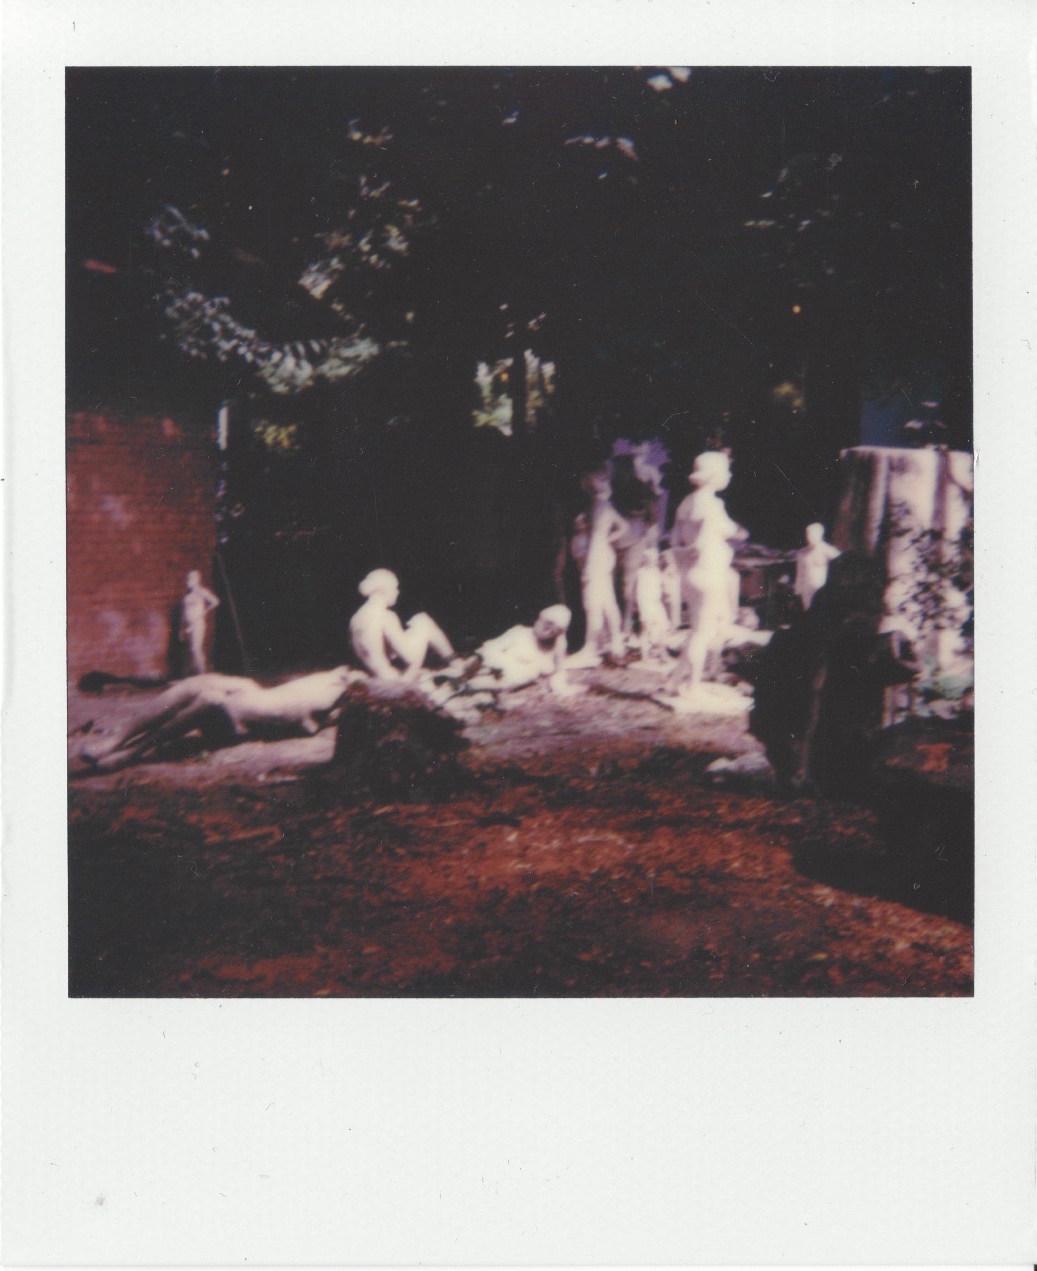 Epreskert by Polaroid 600